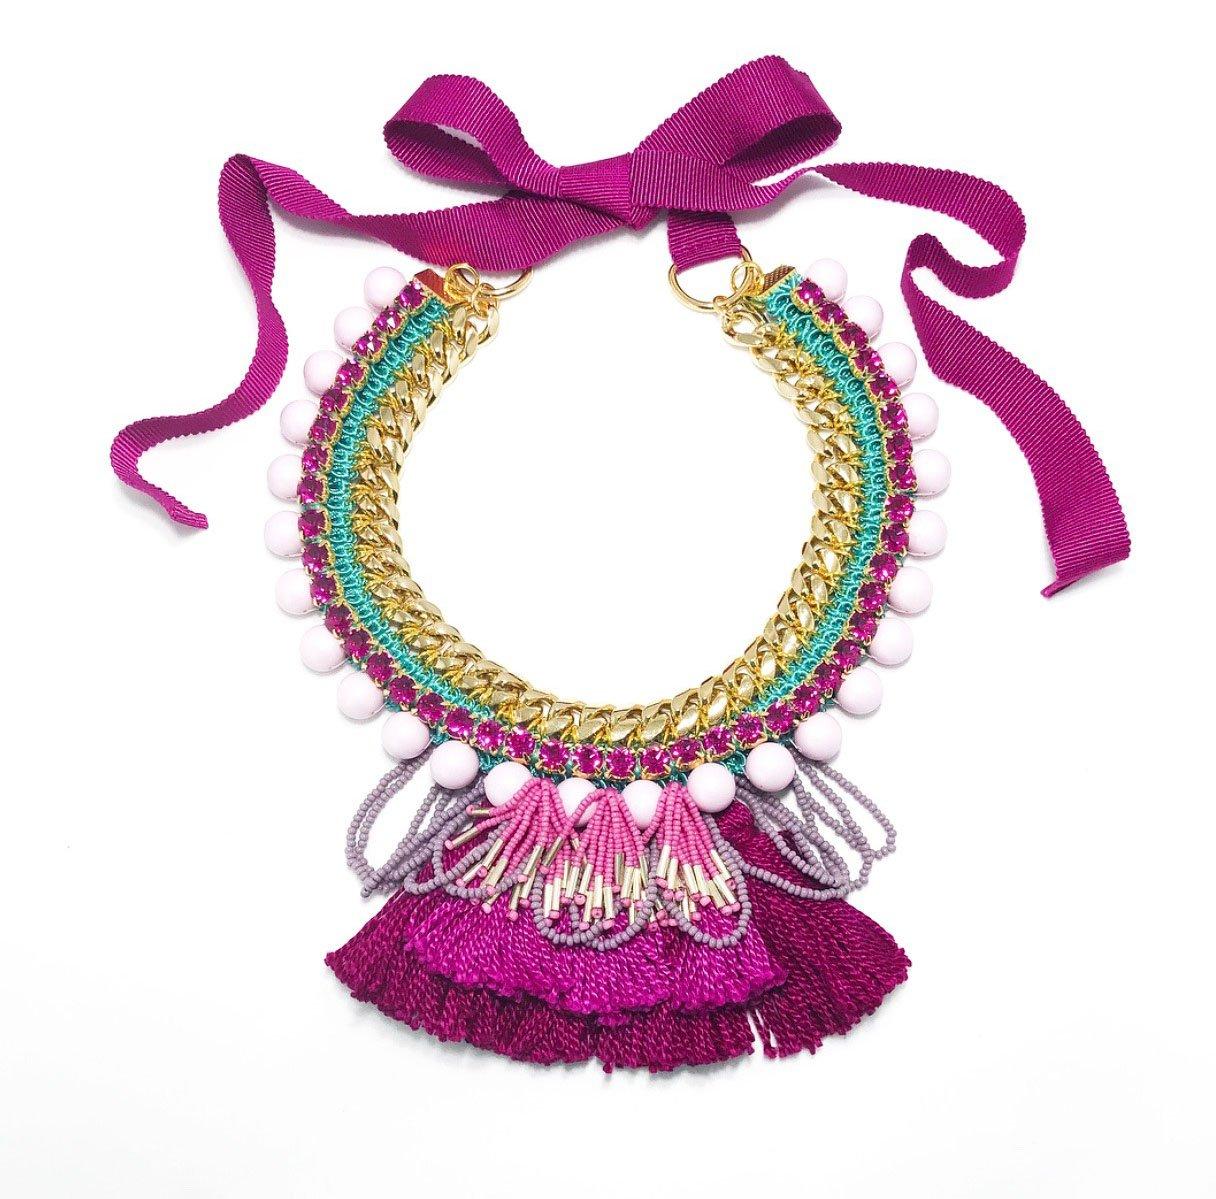 Image of Magenta Tassel Necklace